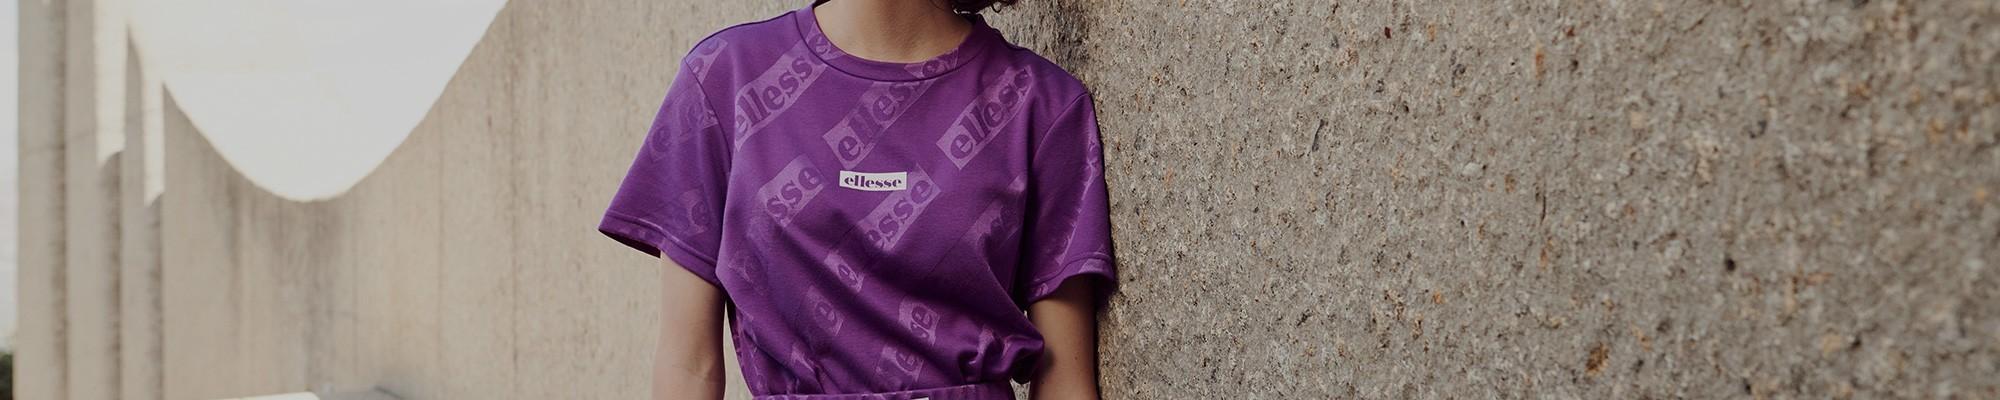 Camisetas deportivas para mujer Ellesse